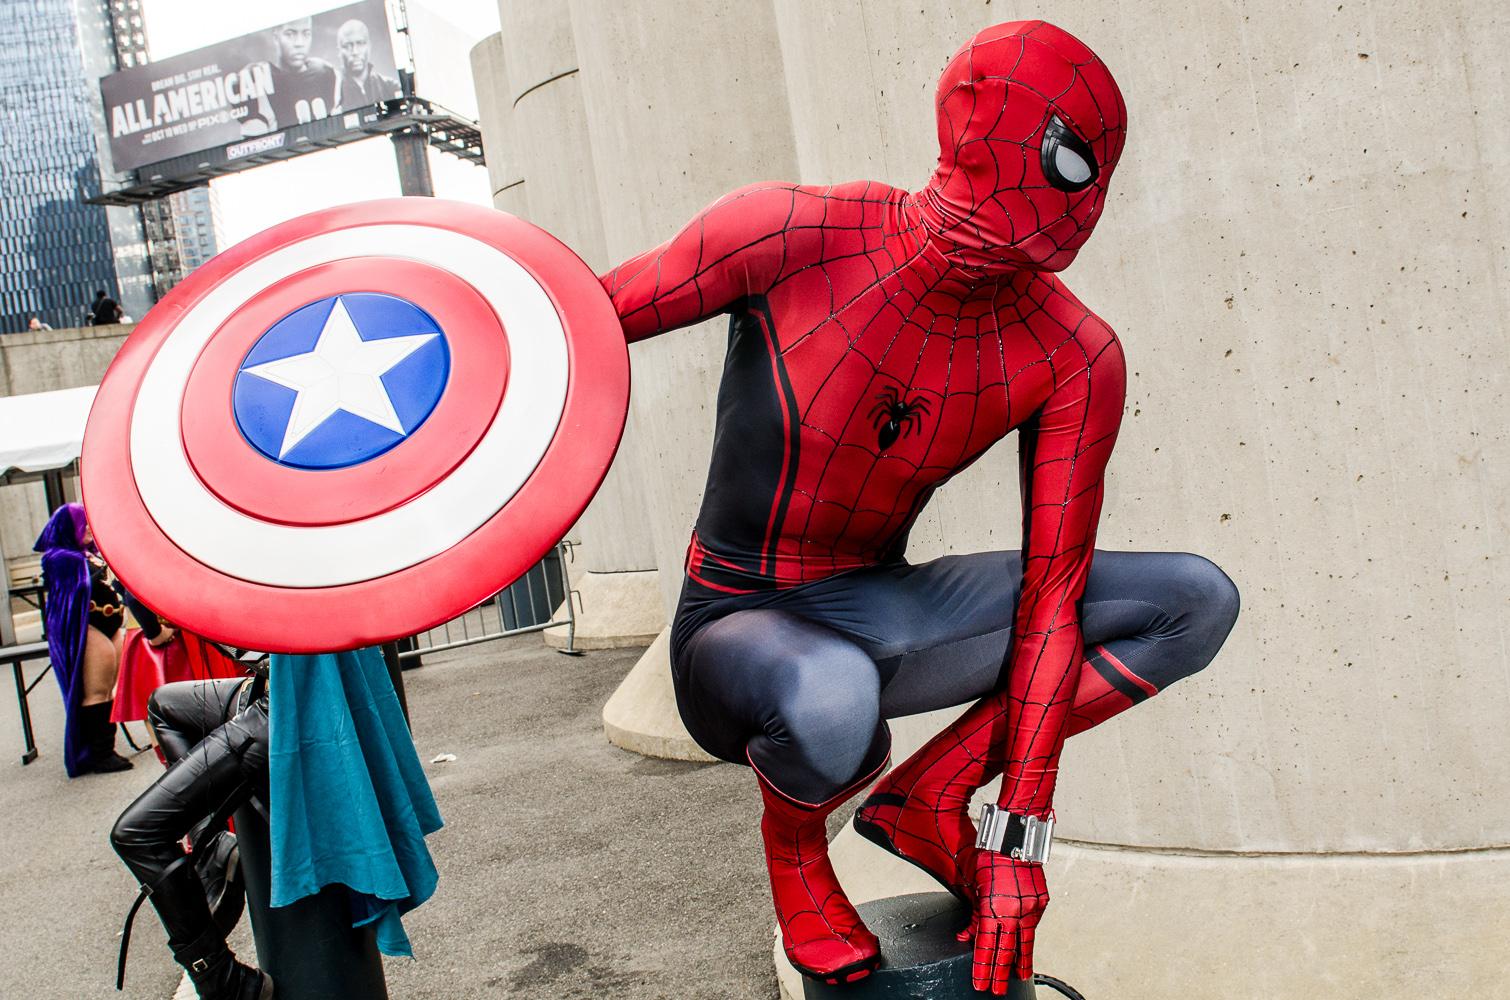 Spider-Man Captain America Shield New York Comic Con 2018 Ben Kaye-148